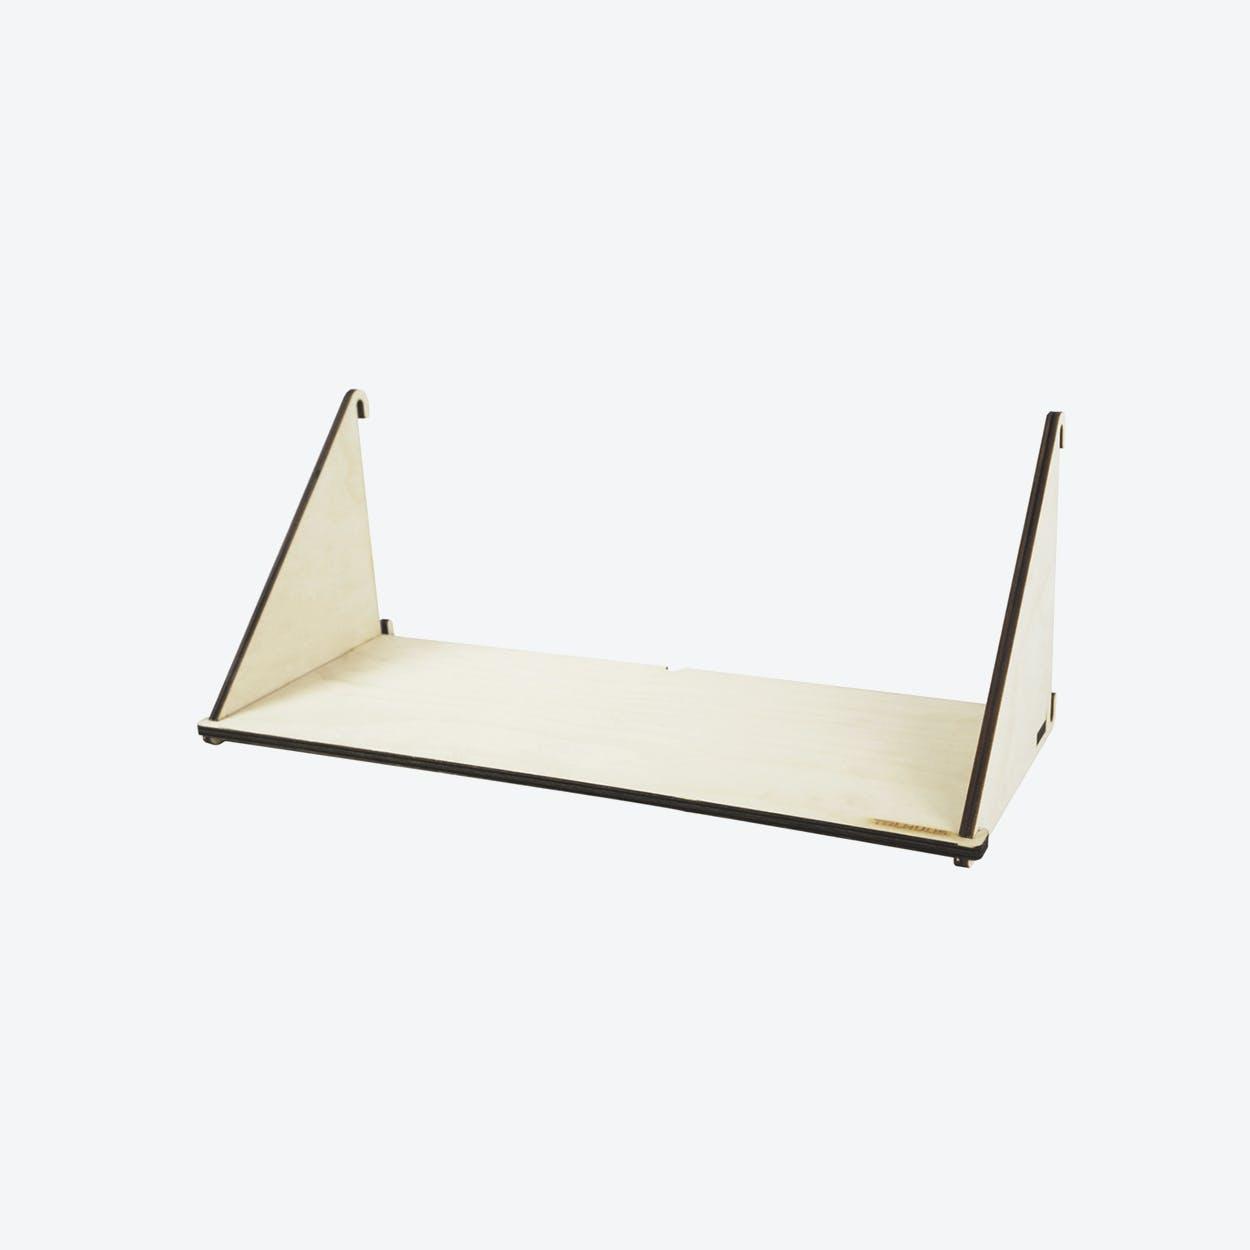 Fency Shelves, Laser Wood, Double